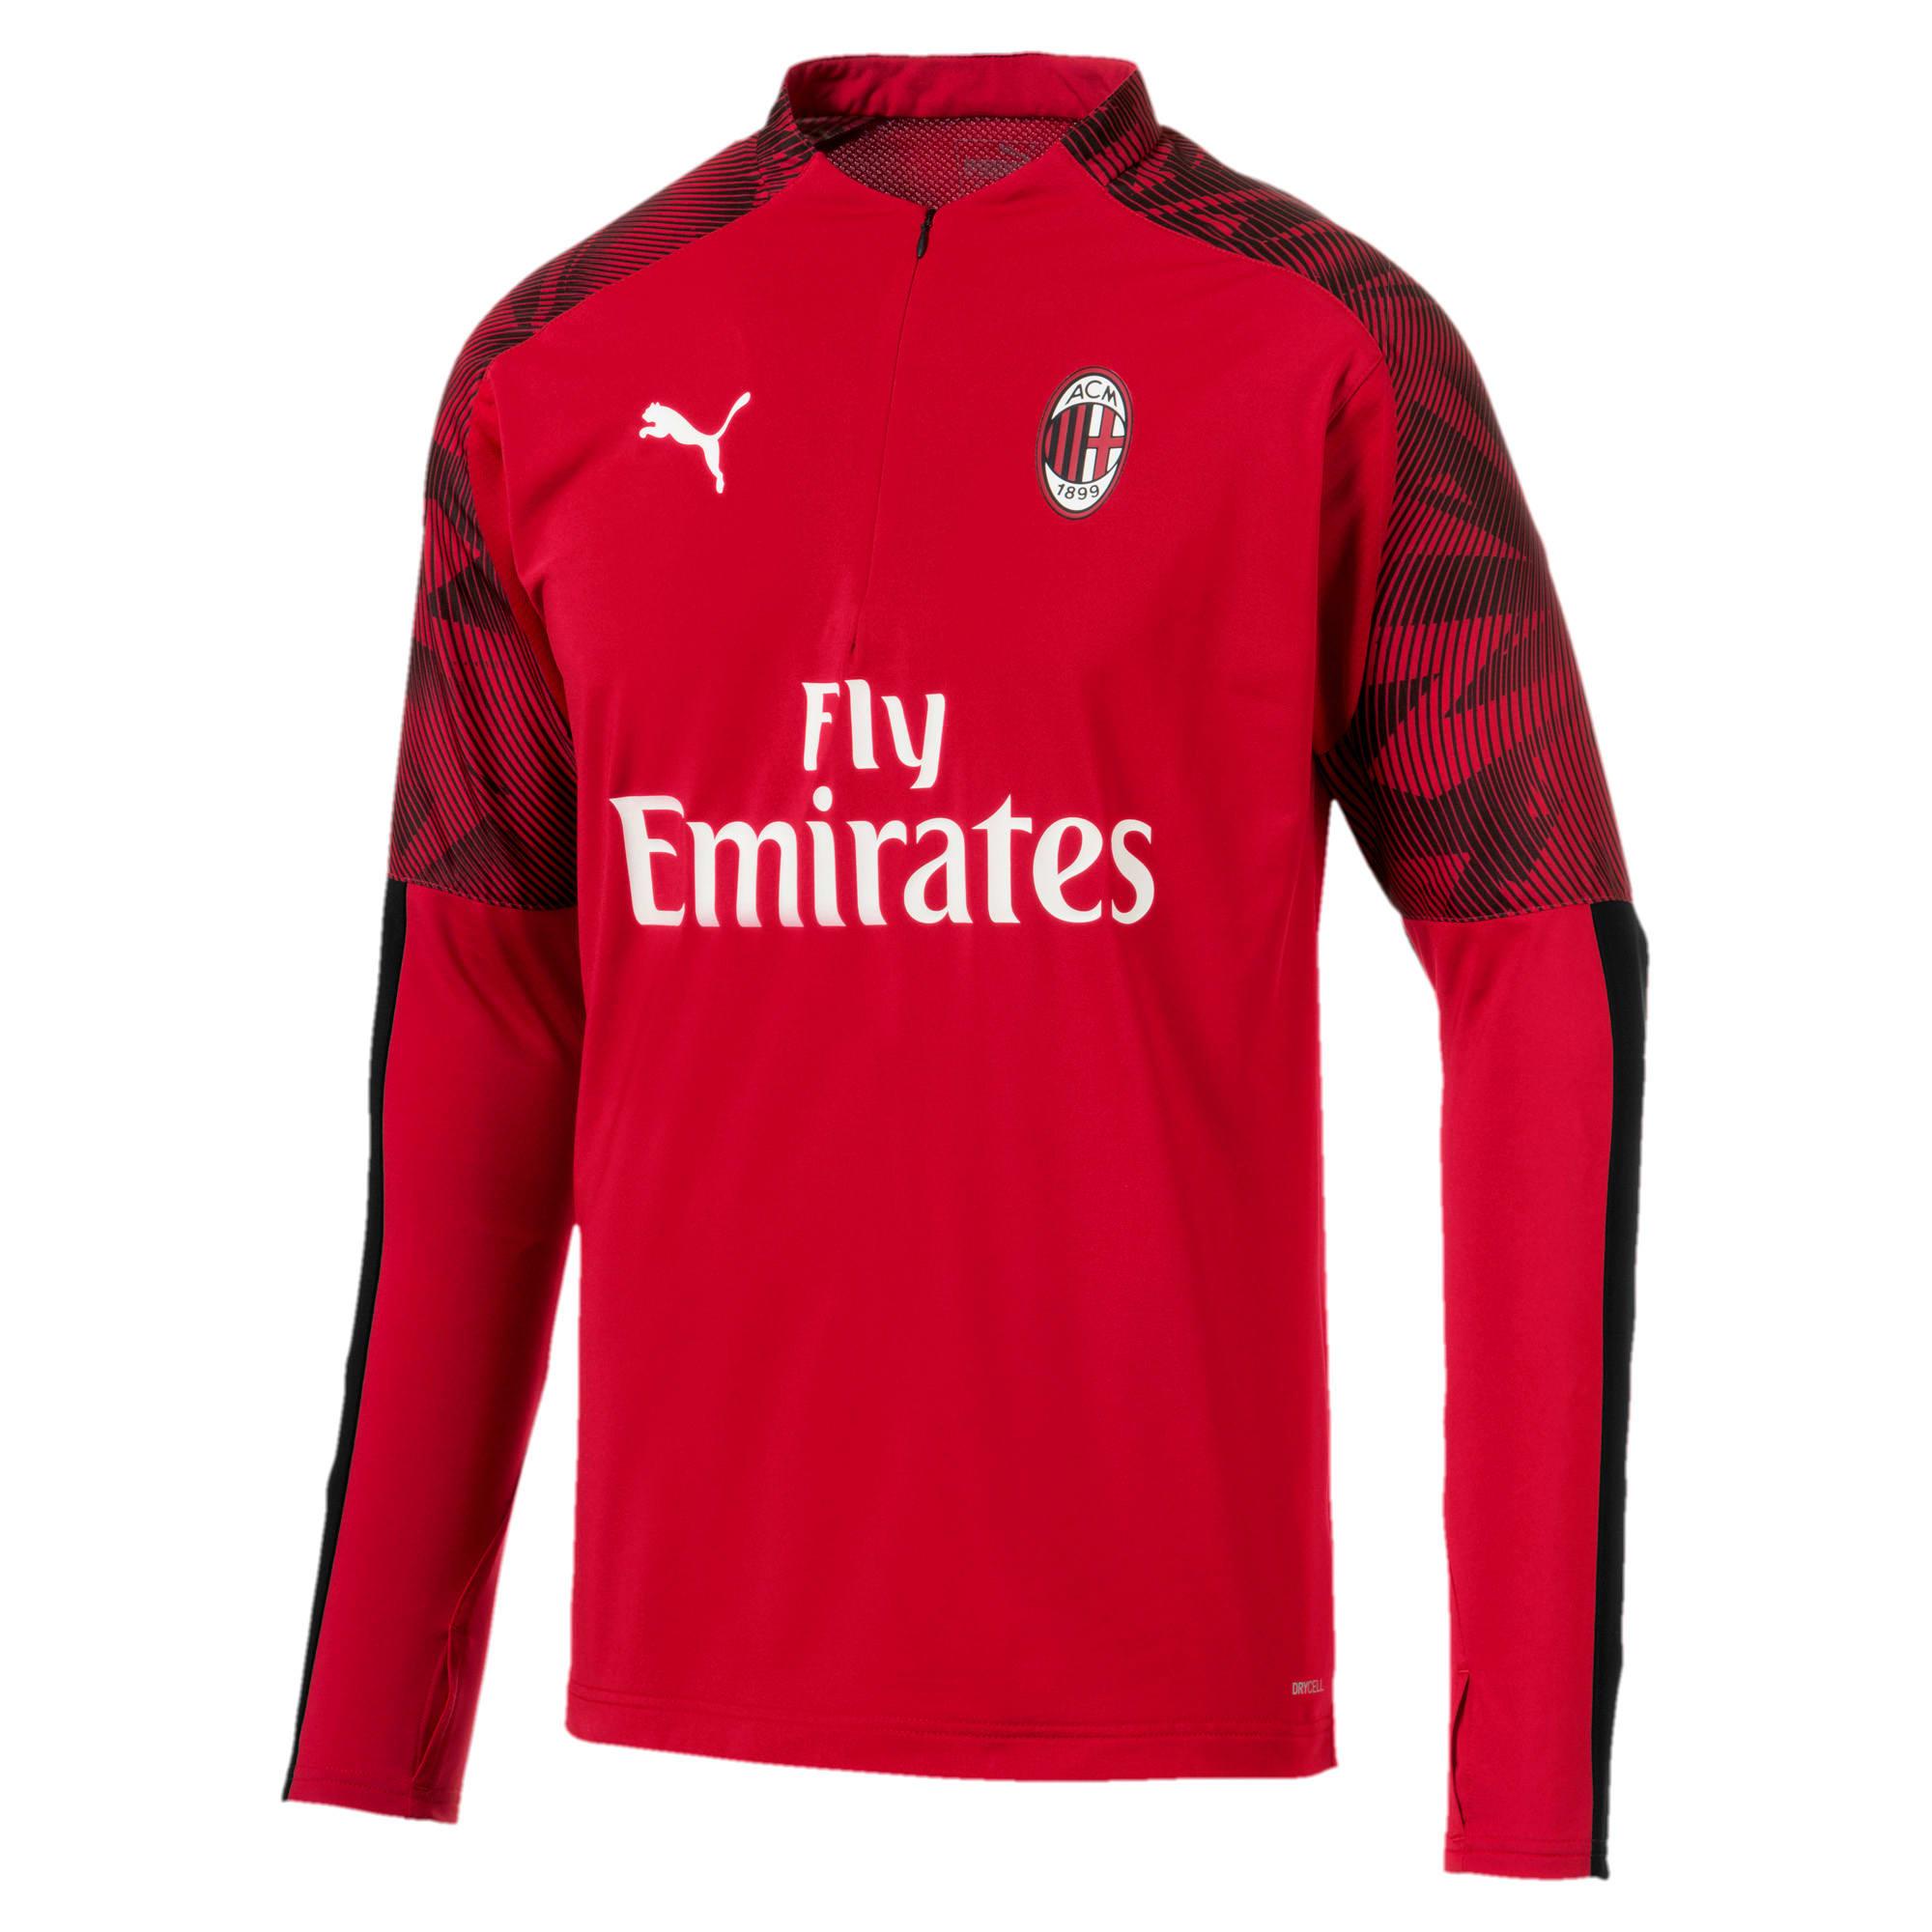 Thumbnail 4 of AC Milan Men's 1/4 Zip Top, Tango Red -Puma Black, medium